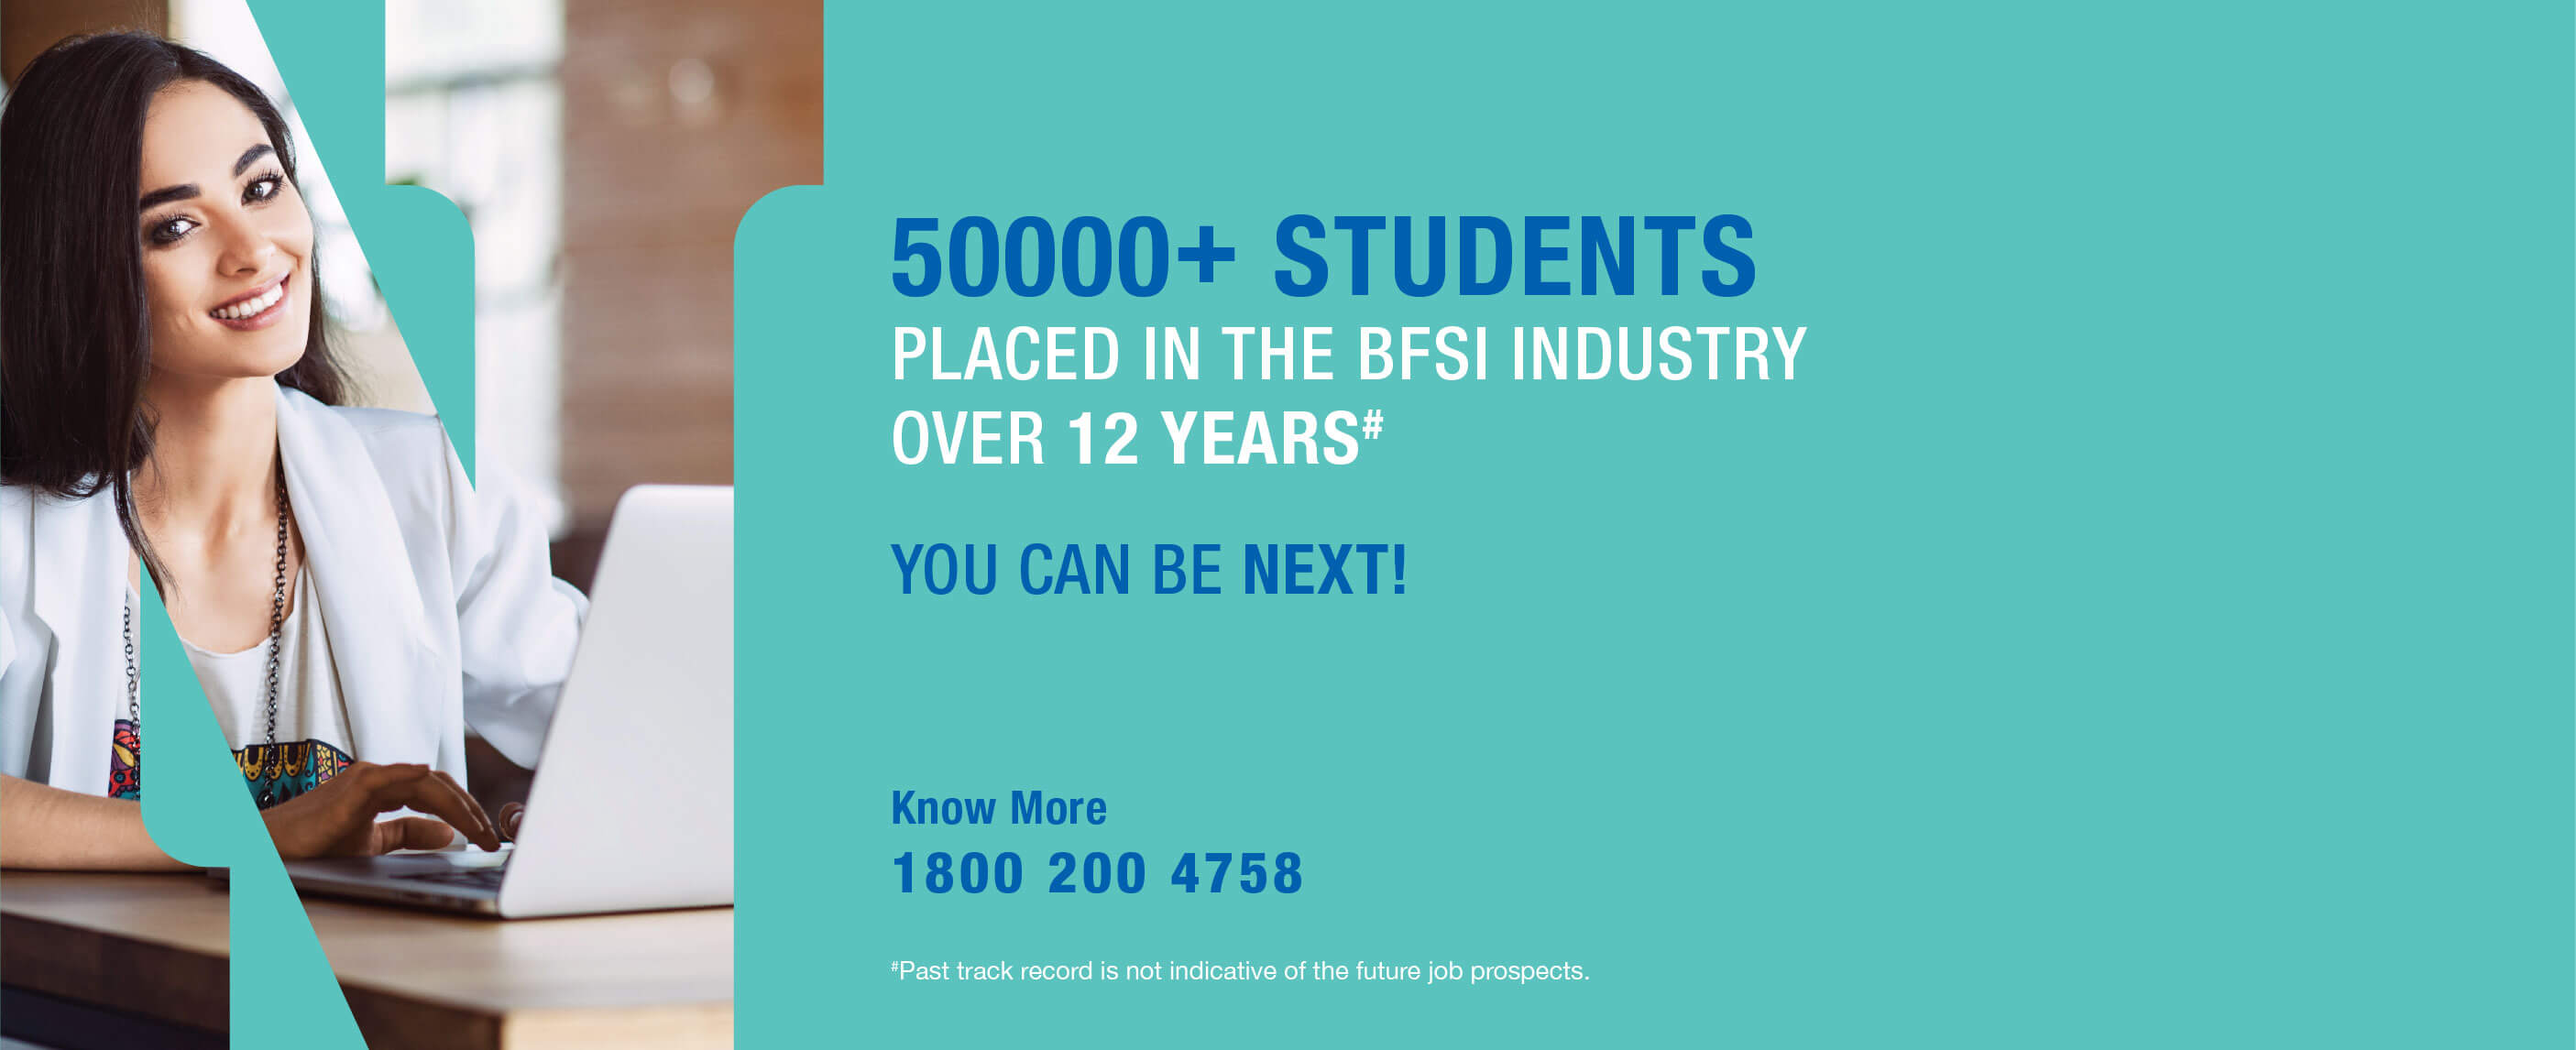 IFBI - For Individuals